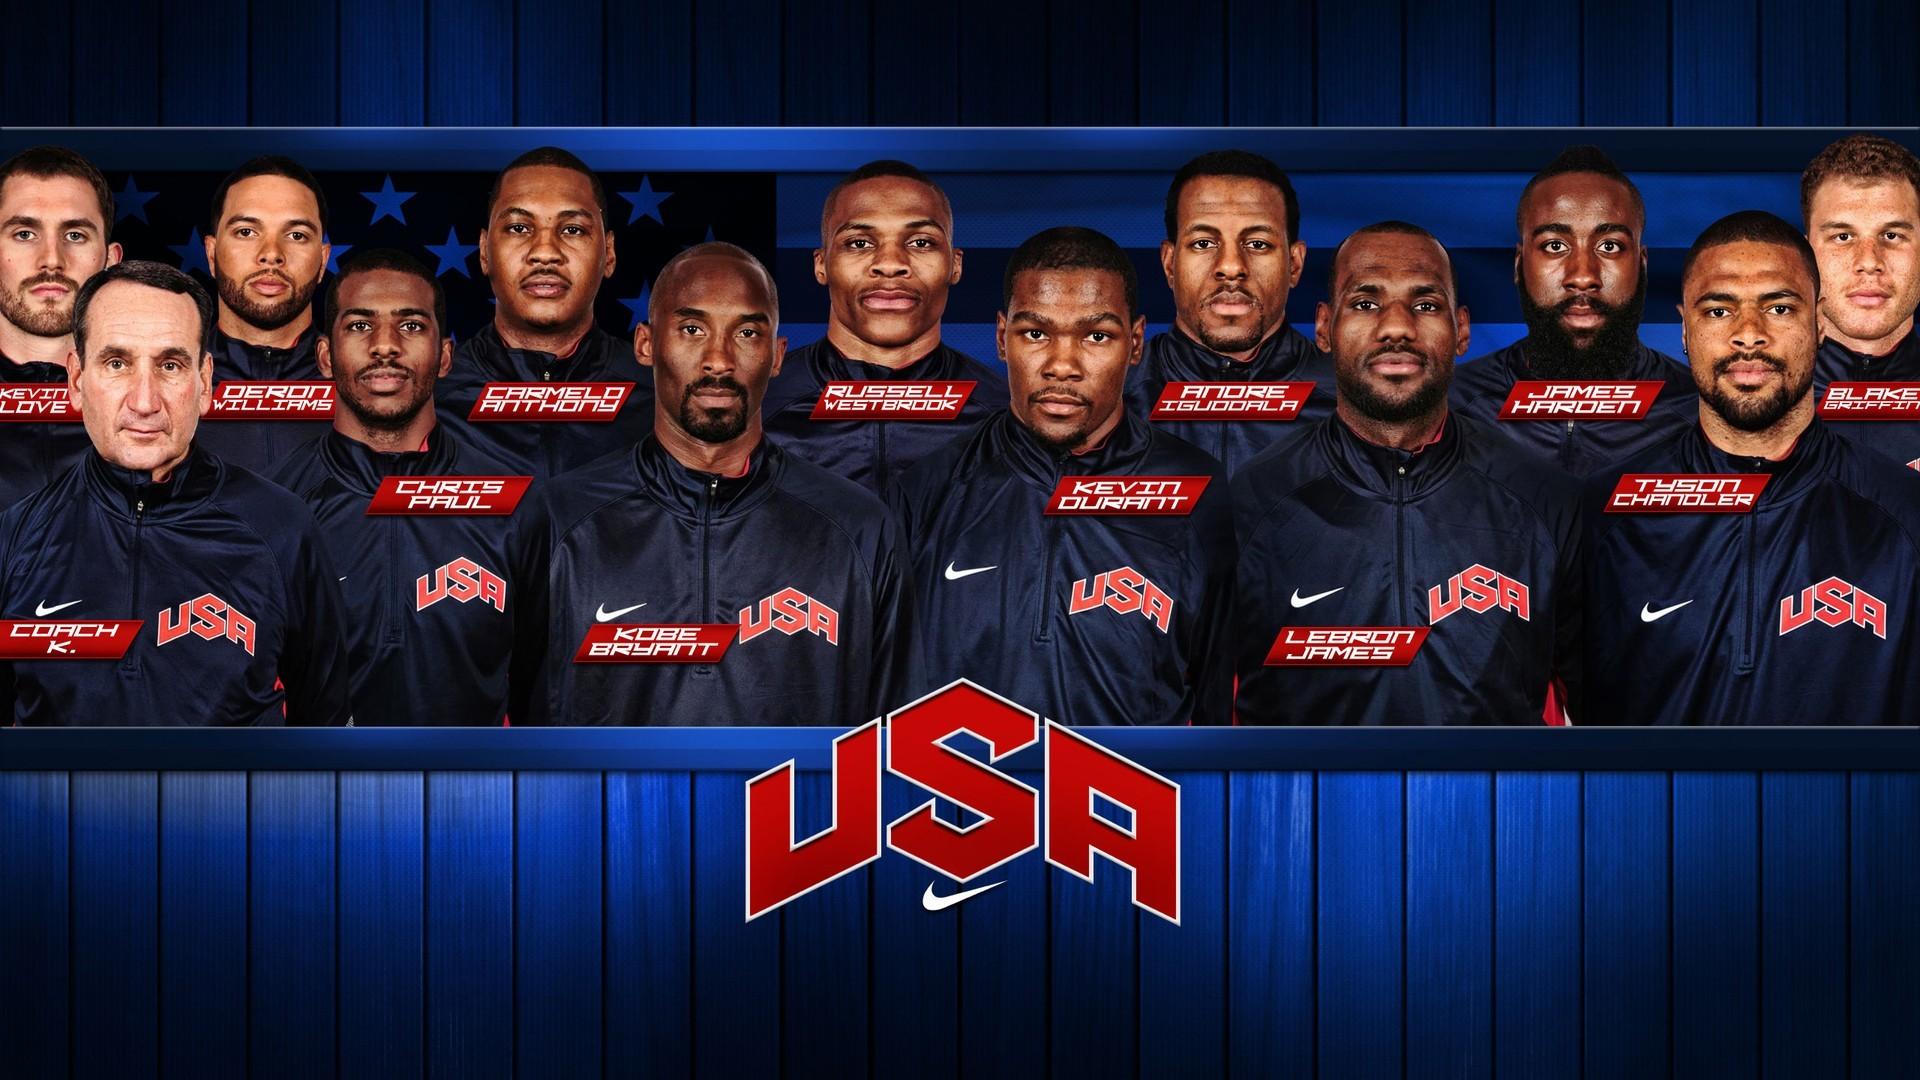 sports team USA NBA basketball Olympics Dream Team Olympic Games .